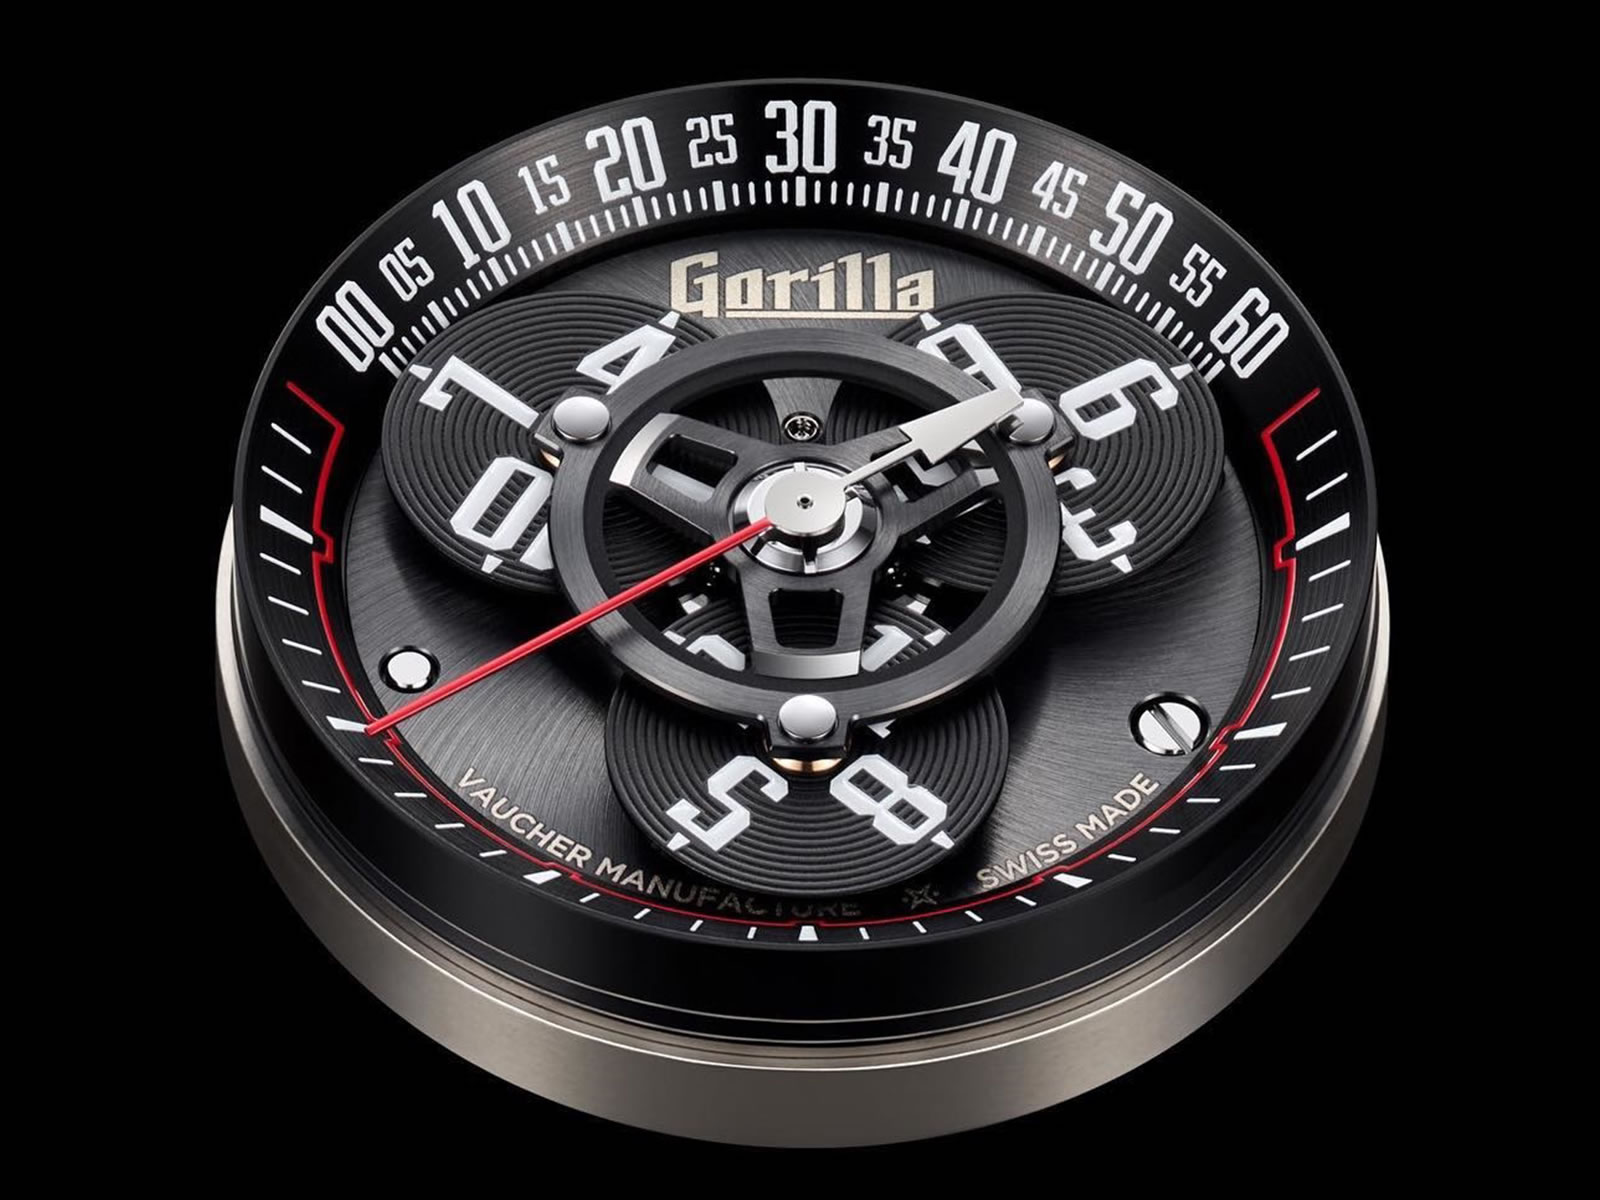 gorilla-fastback-gt-drift-10-.jpg